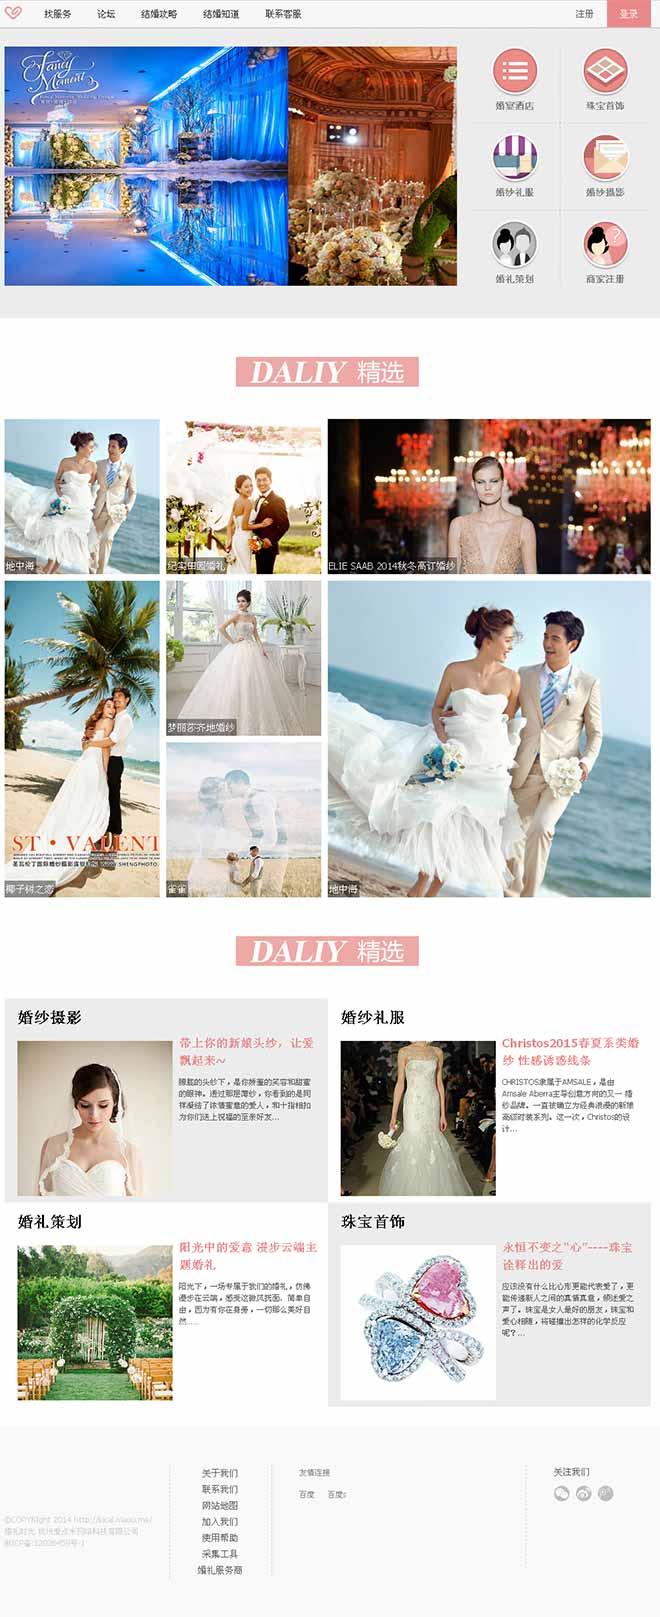 Wedding婚礼服务网 php免费网站源码 百度云盘直接下载